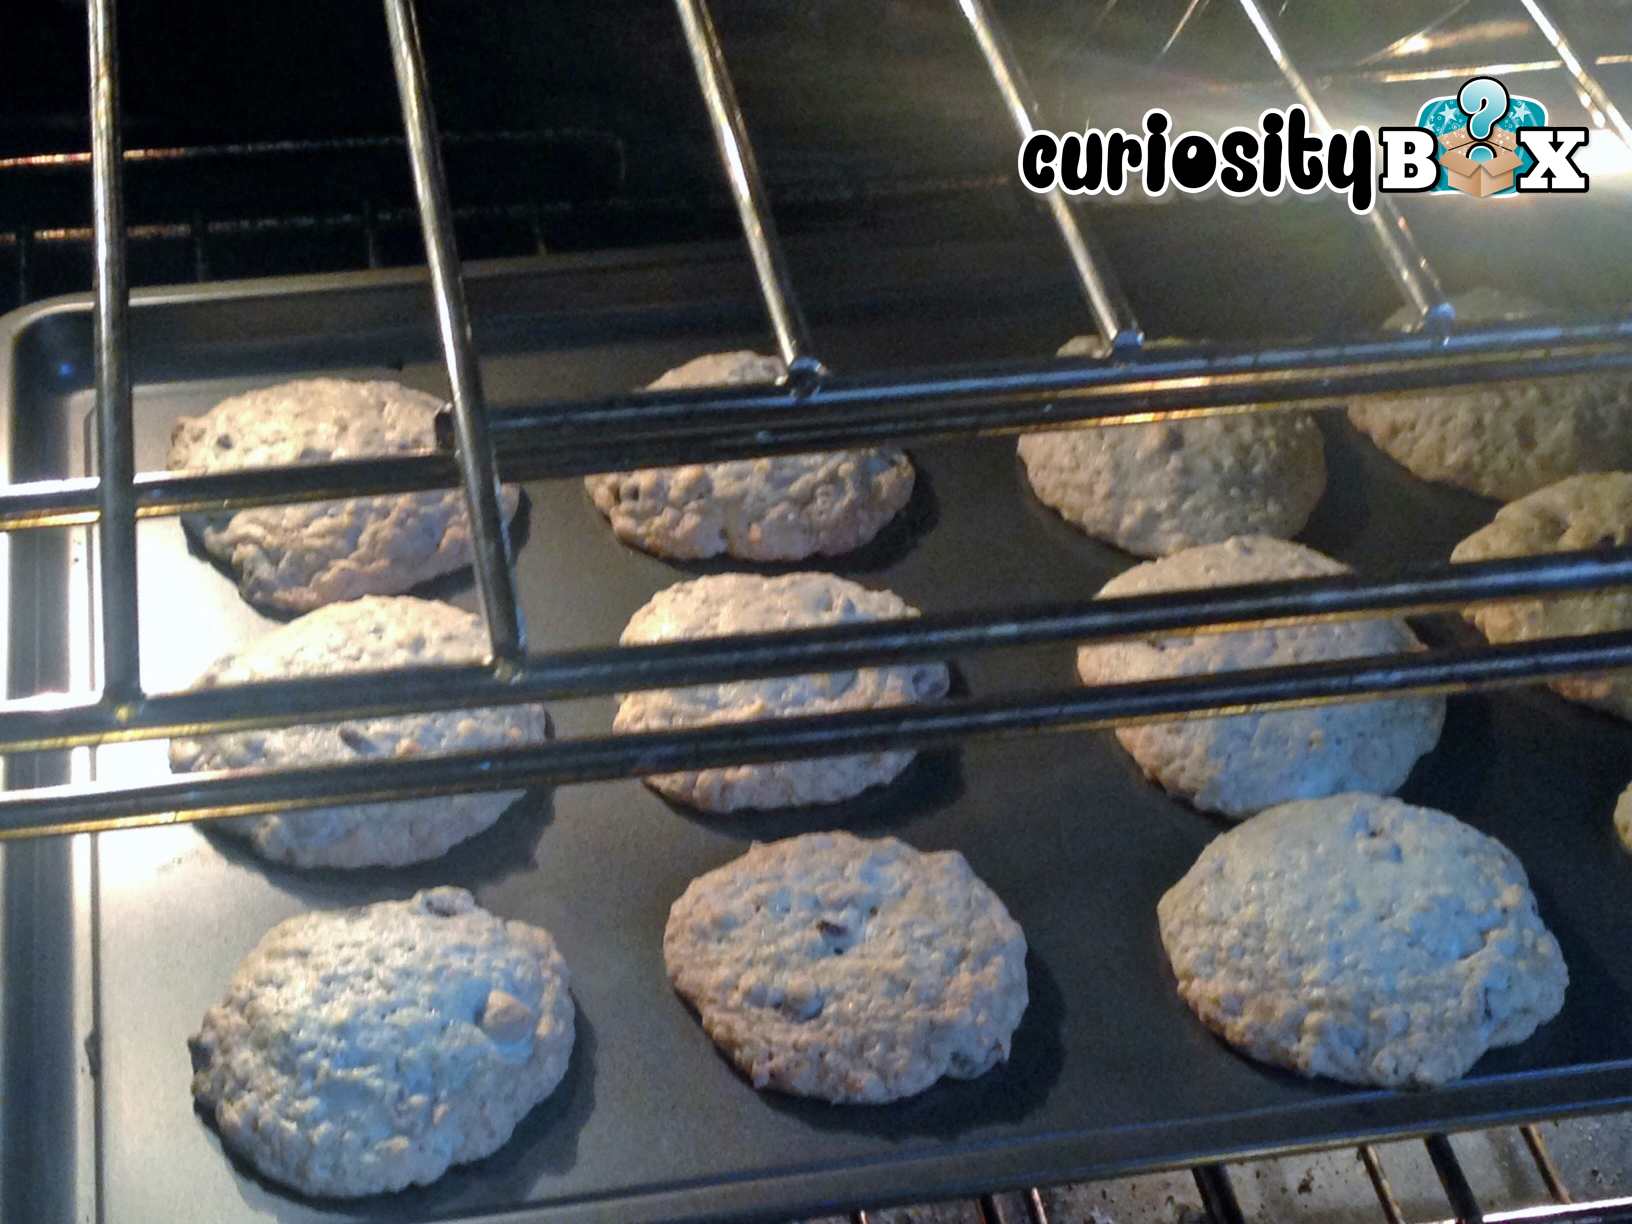 Curiosity_Box_Oatmealcookies4 copy.jpg